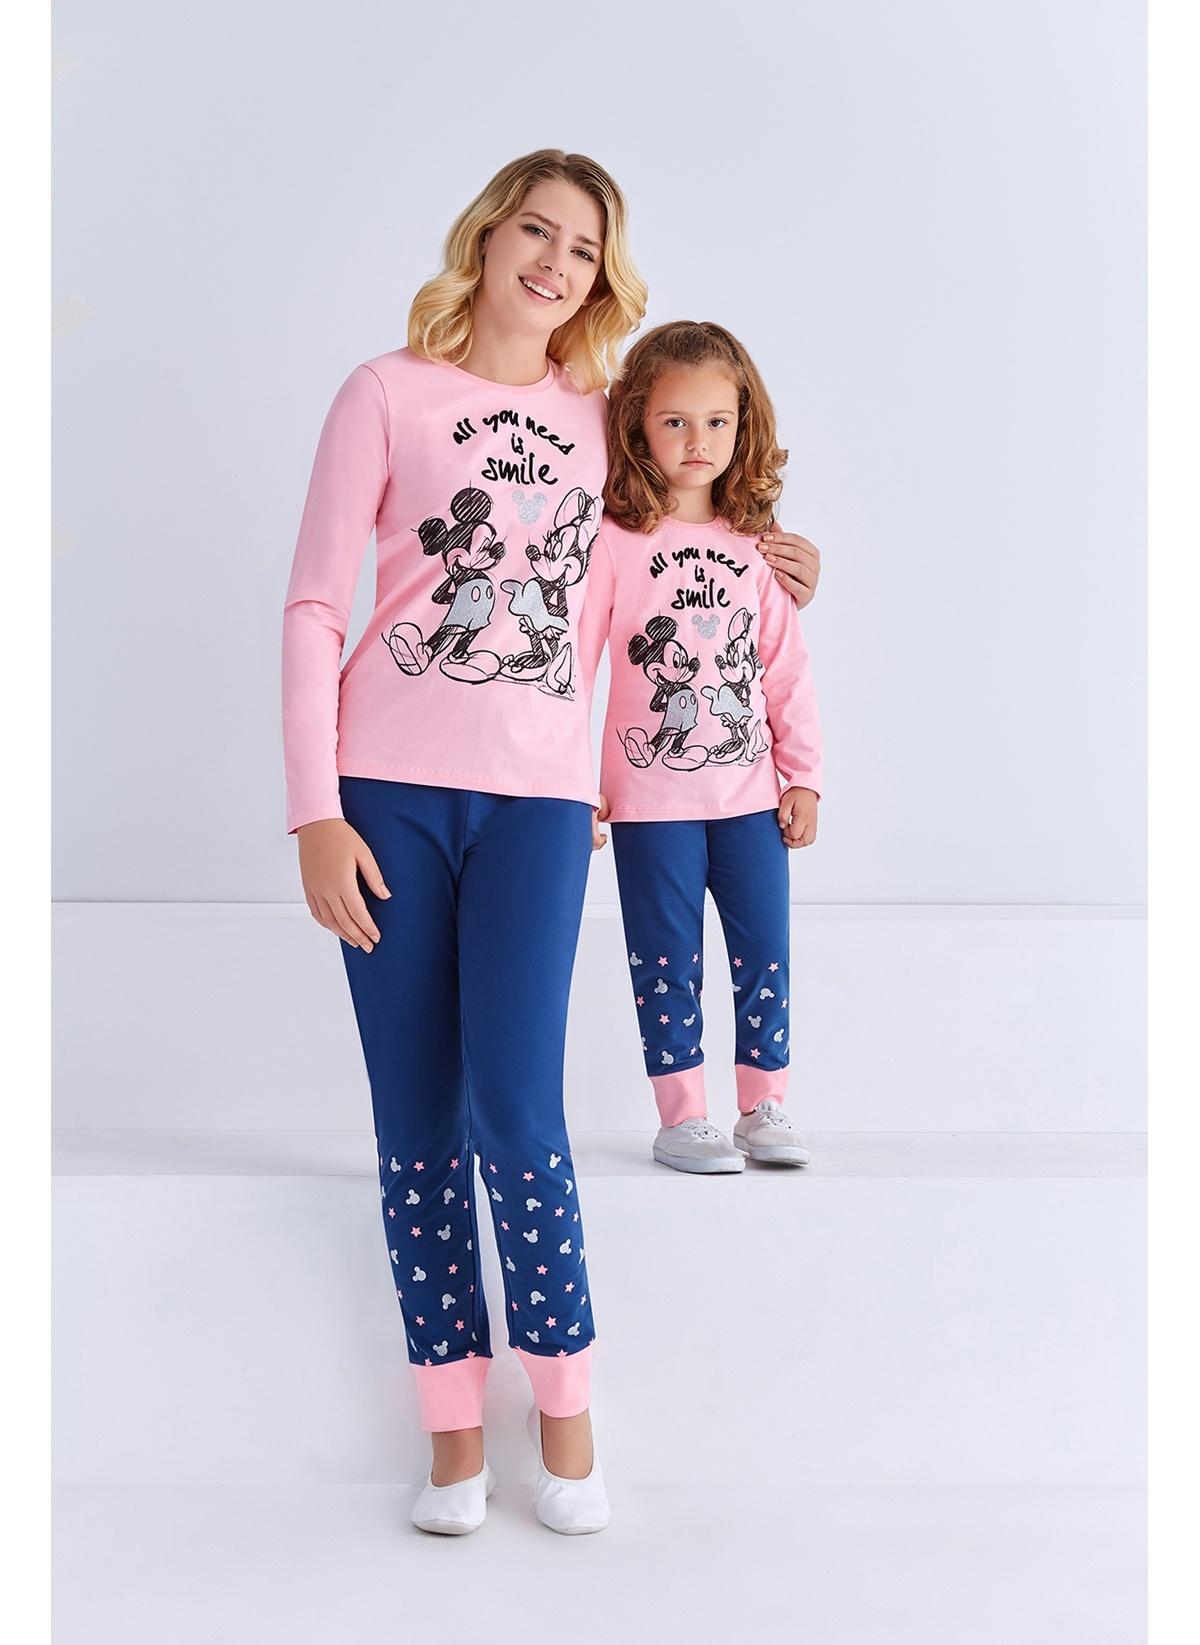 Mickey Mouse Mickey & Minnie Mouse Lisanslı Kadın Pijama Takımı Açık Pembe D4005-S Mickey Mouse Lisanslı Kadın Pija